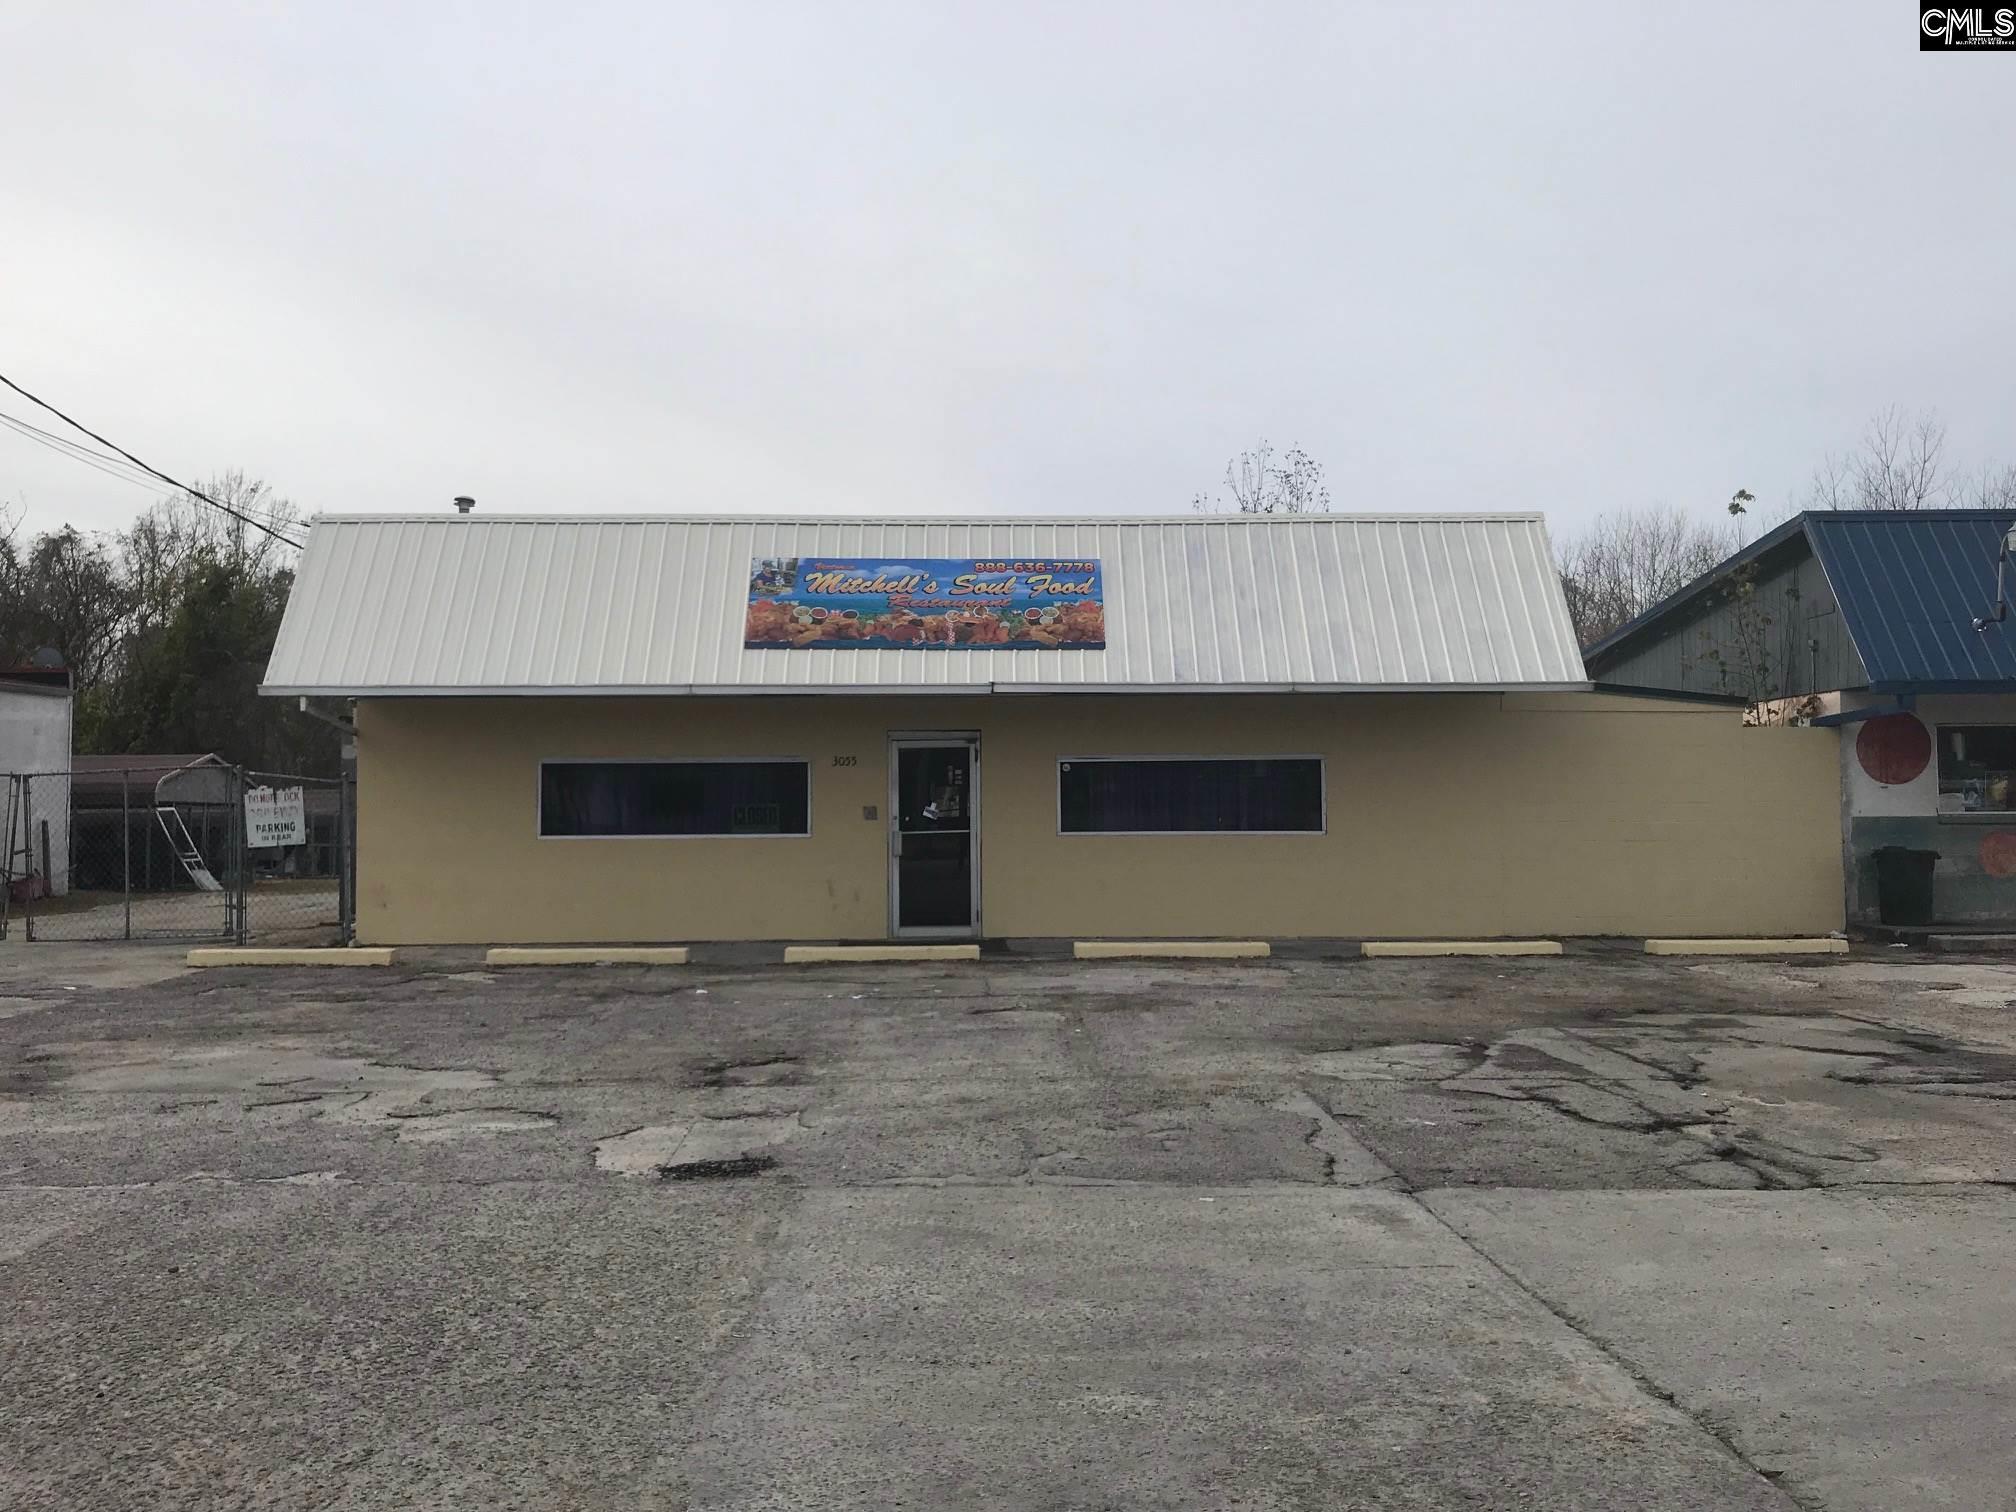 3055 Bluff Columbia, SC 29209-0000